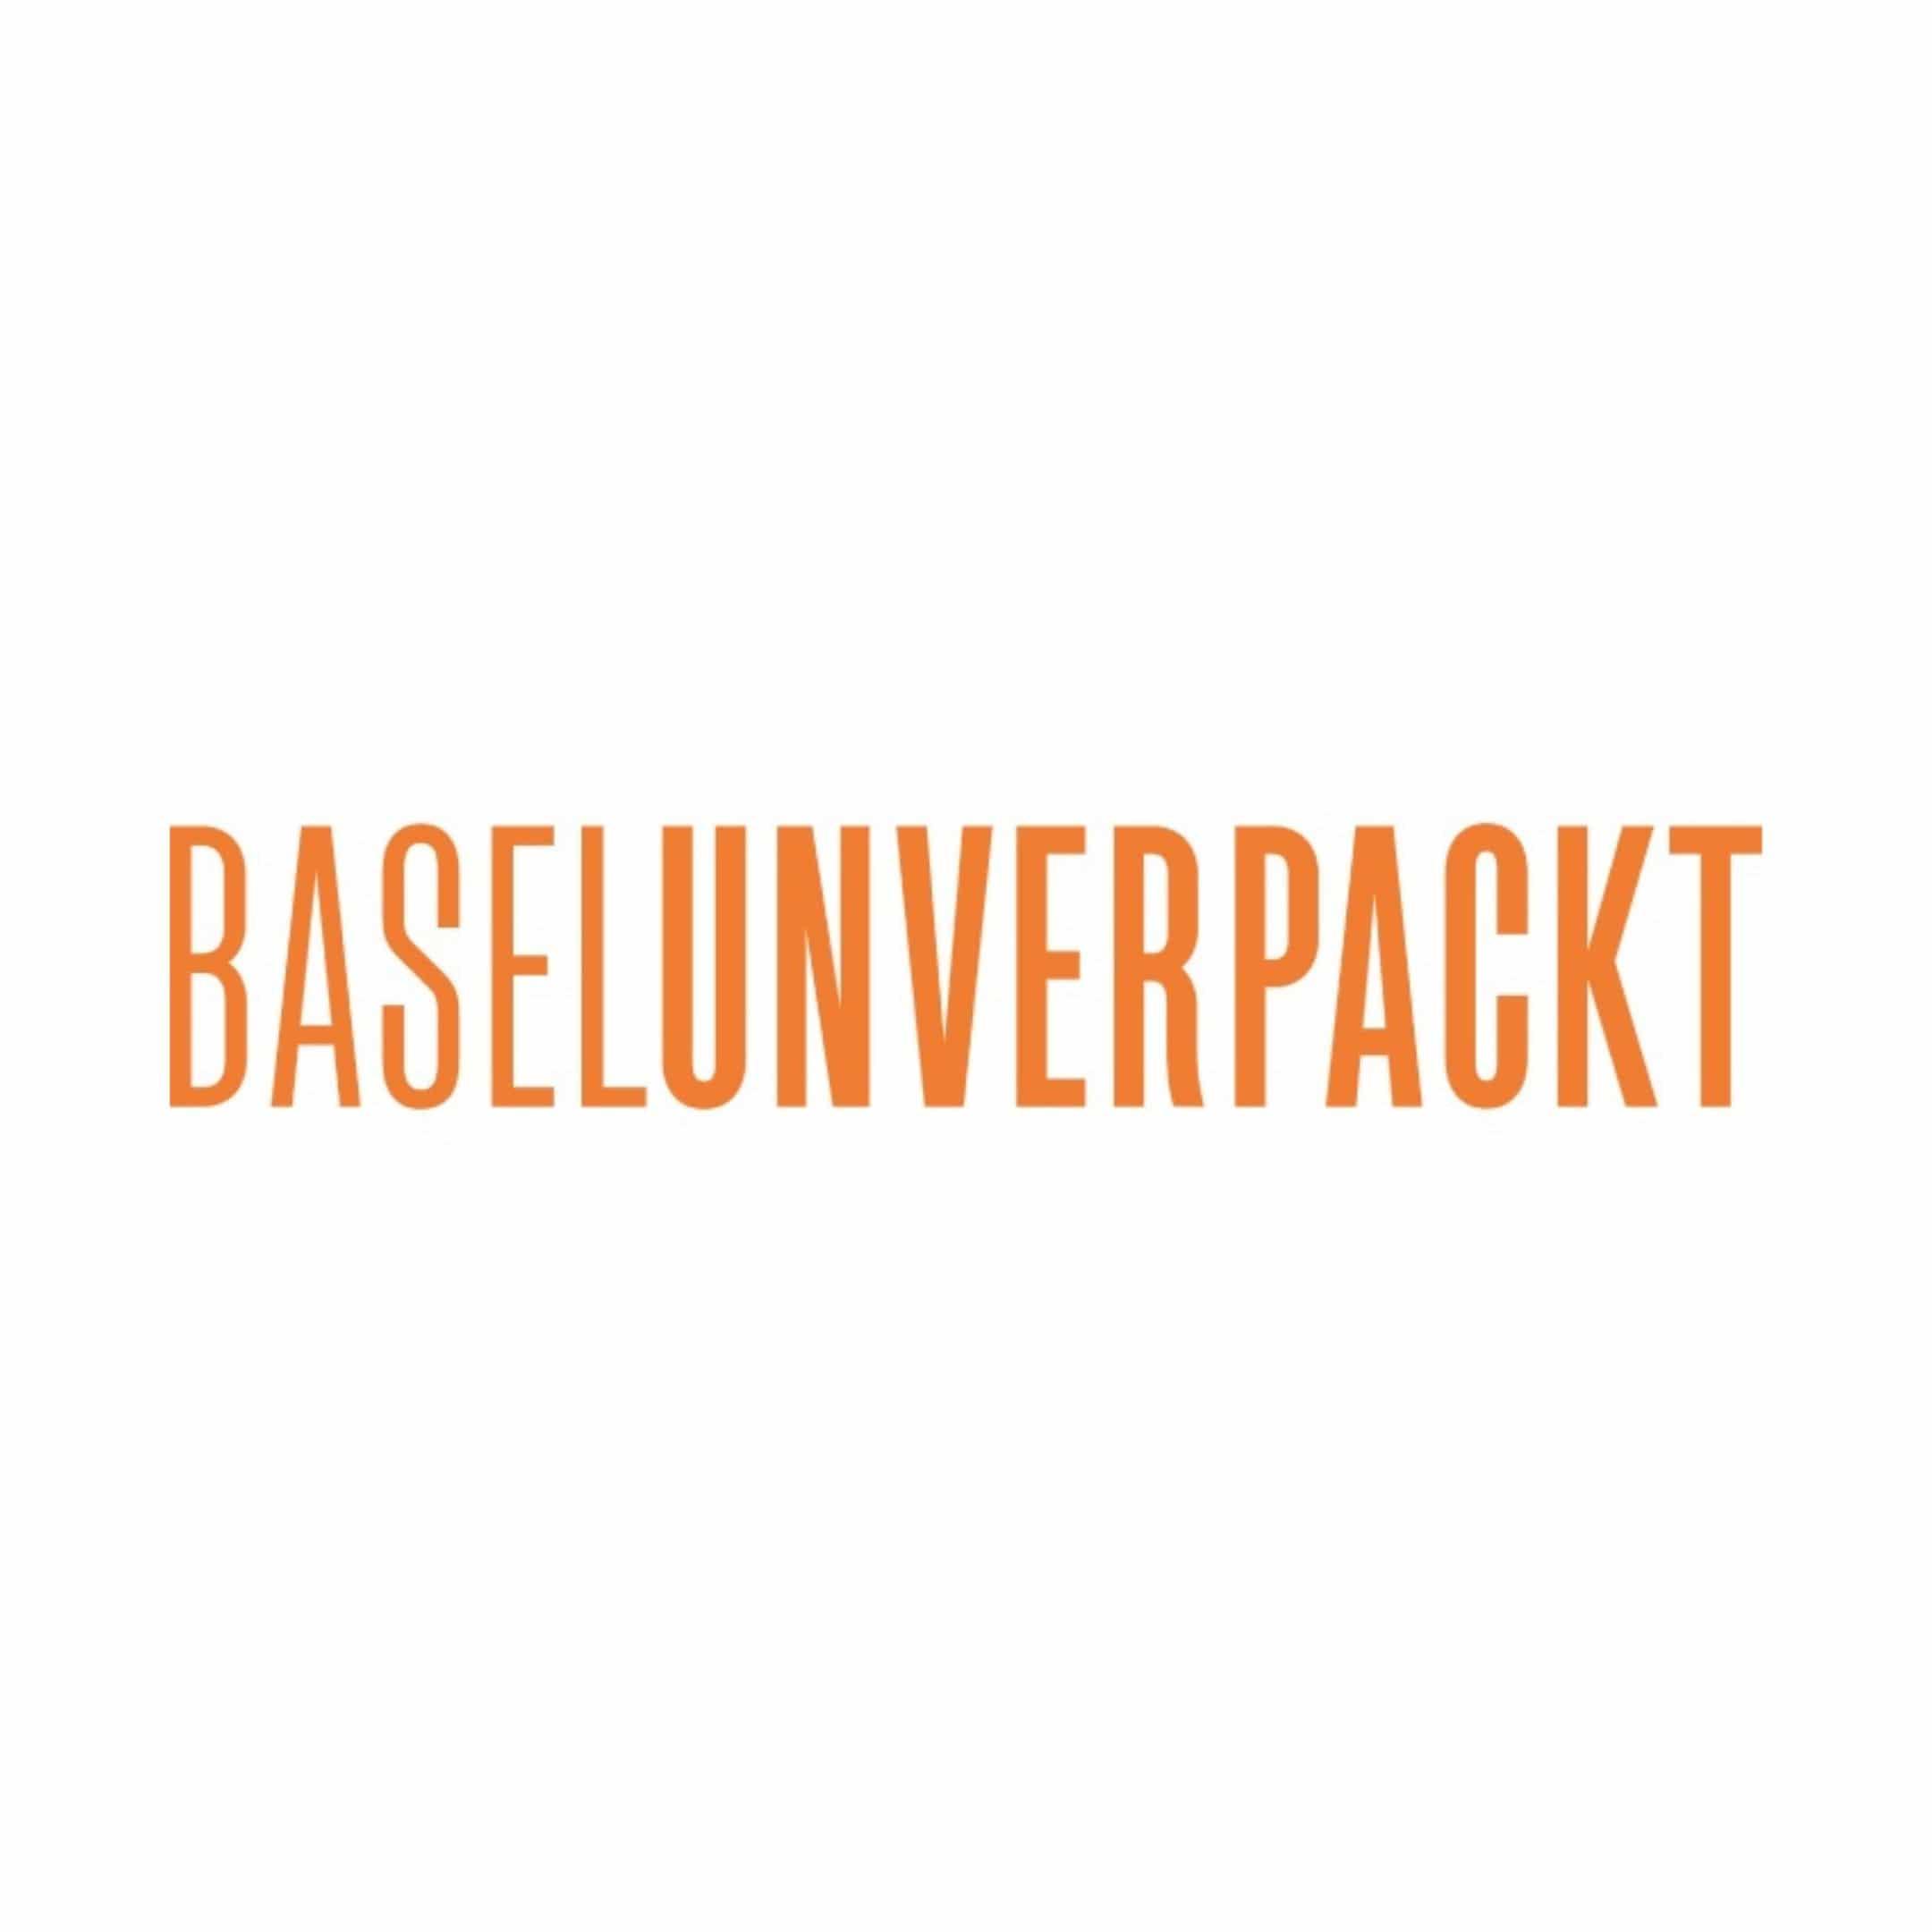 Basel unverpackt